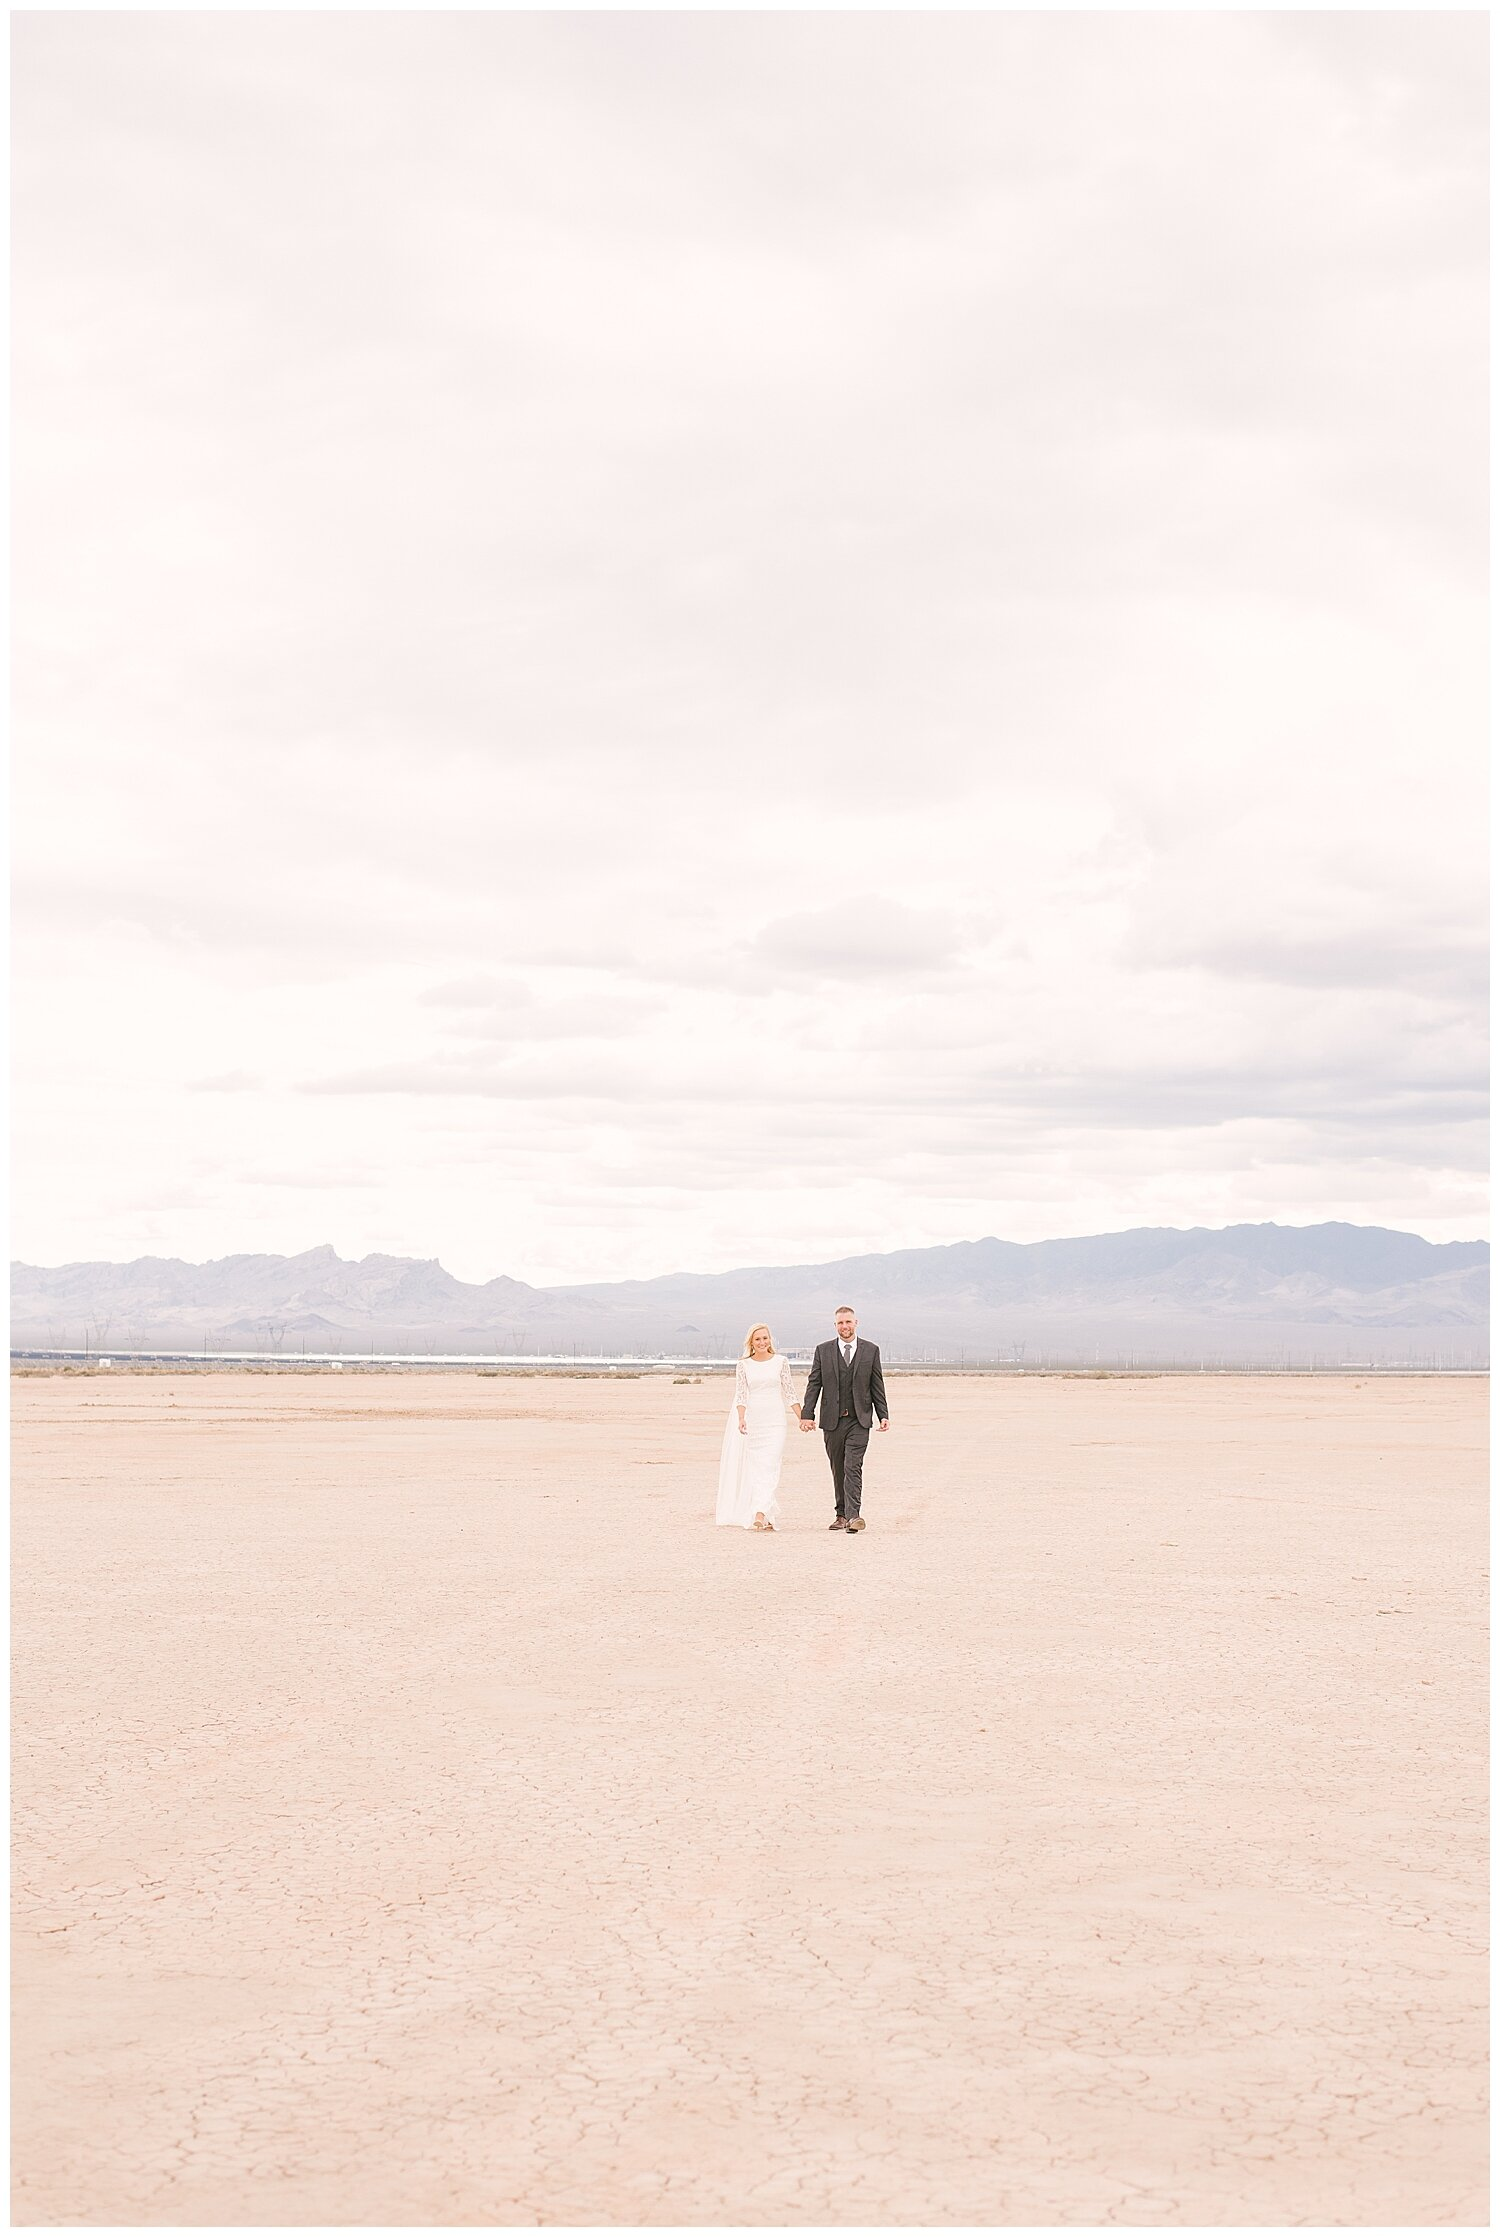 Dry Lake Bed Wedding Las Vegas Wedding And Elopement Photographers Las Vegas Elopement Wedding Photographer